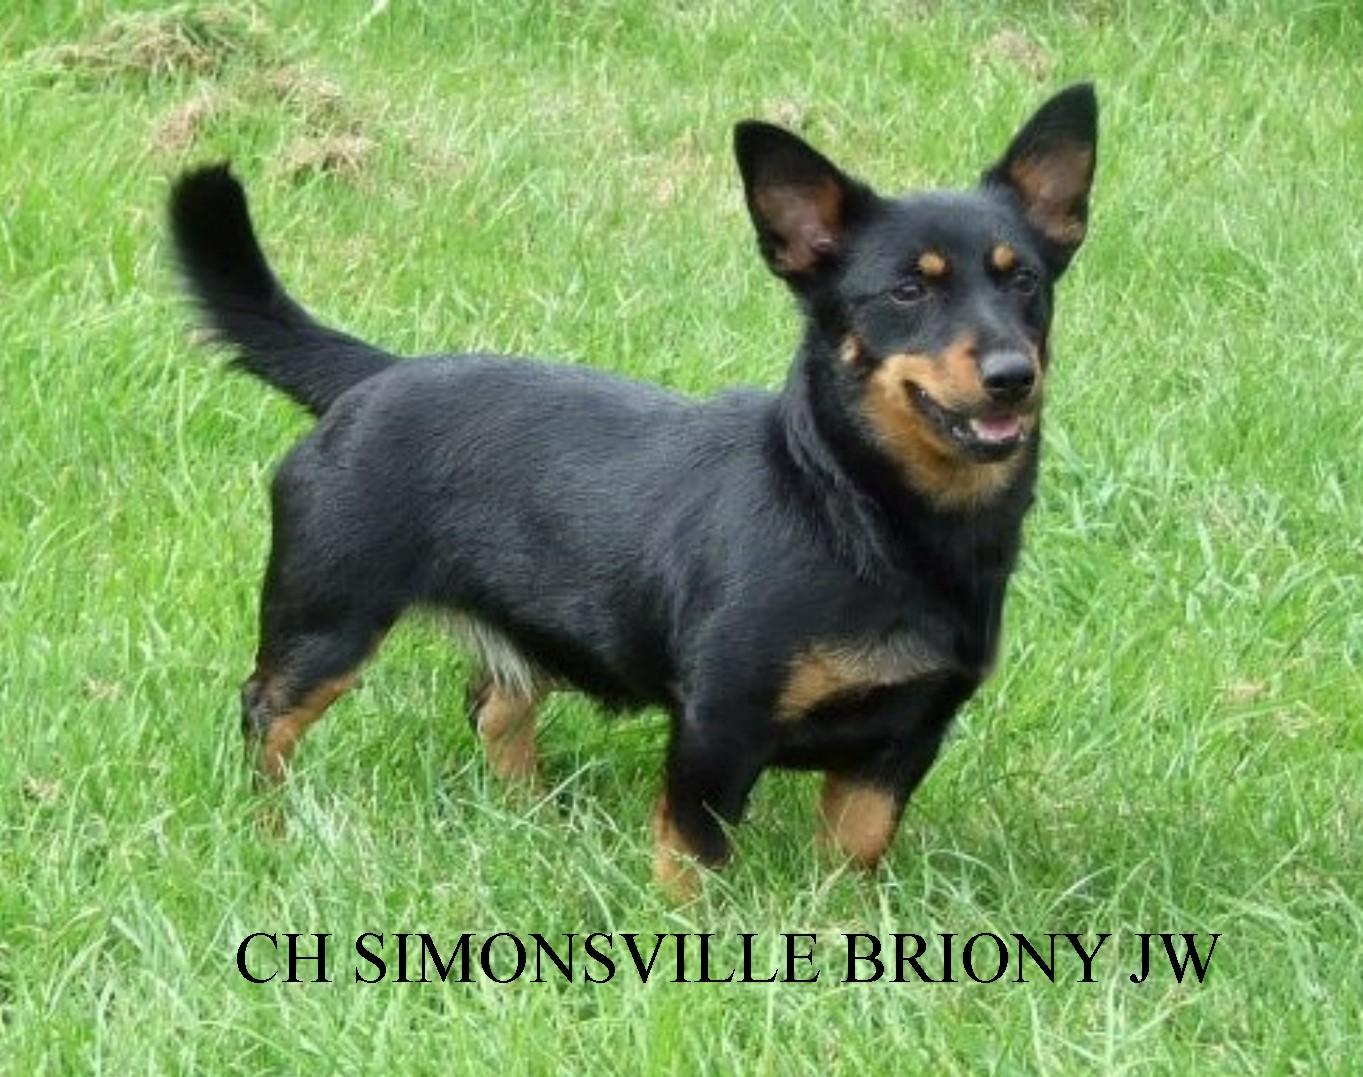 Lancashire Heeler Dog: Lancashire Simonsville Lancashire Heelers Gallery Breed